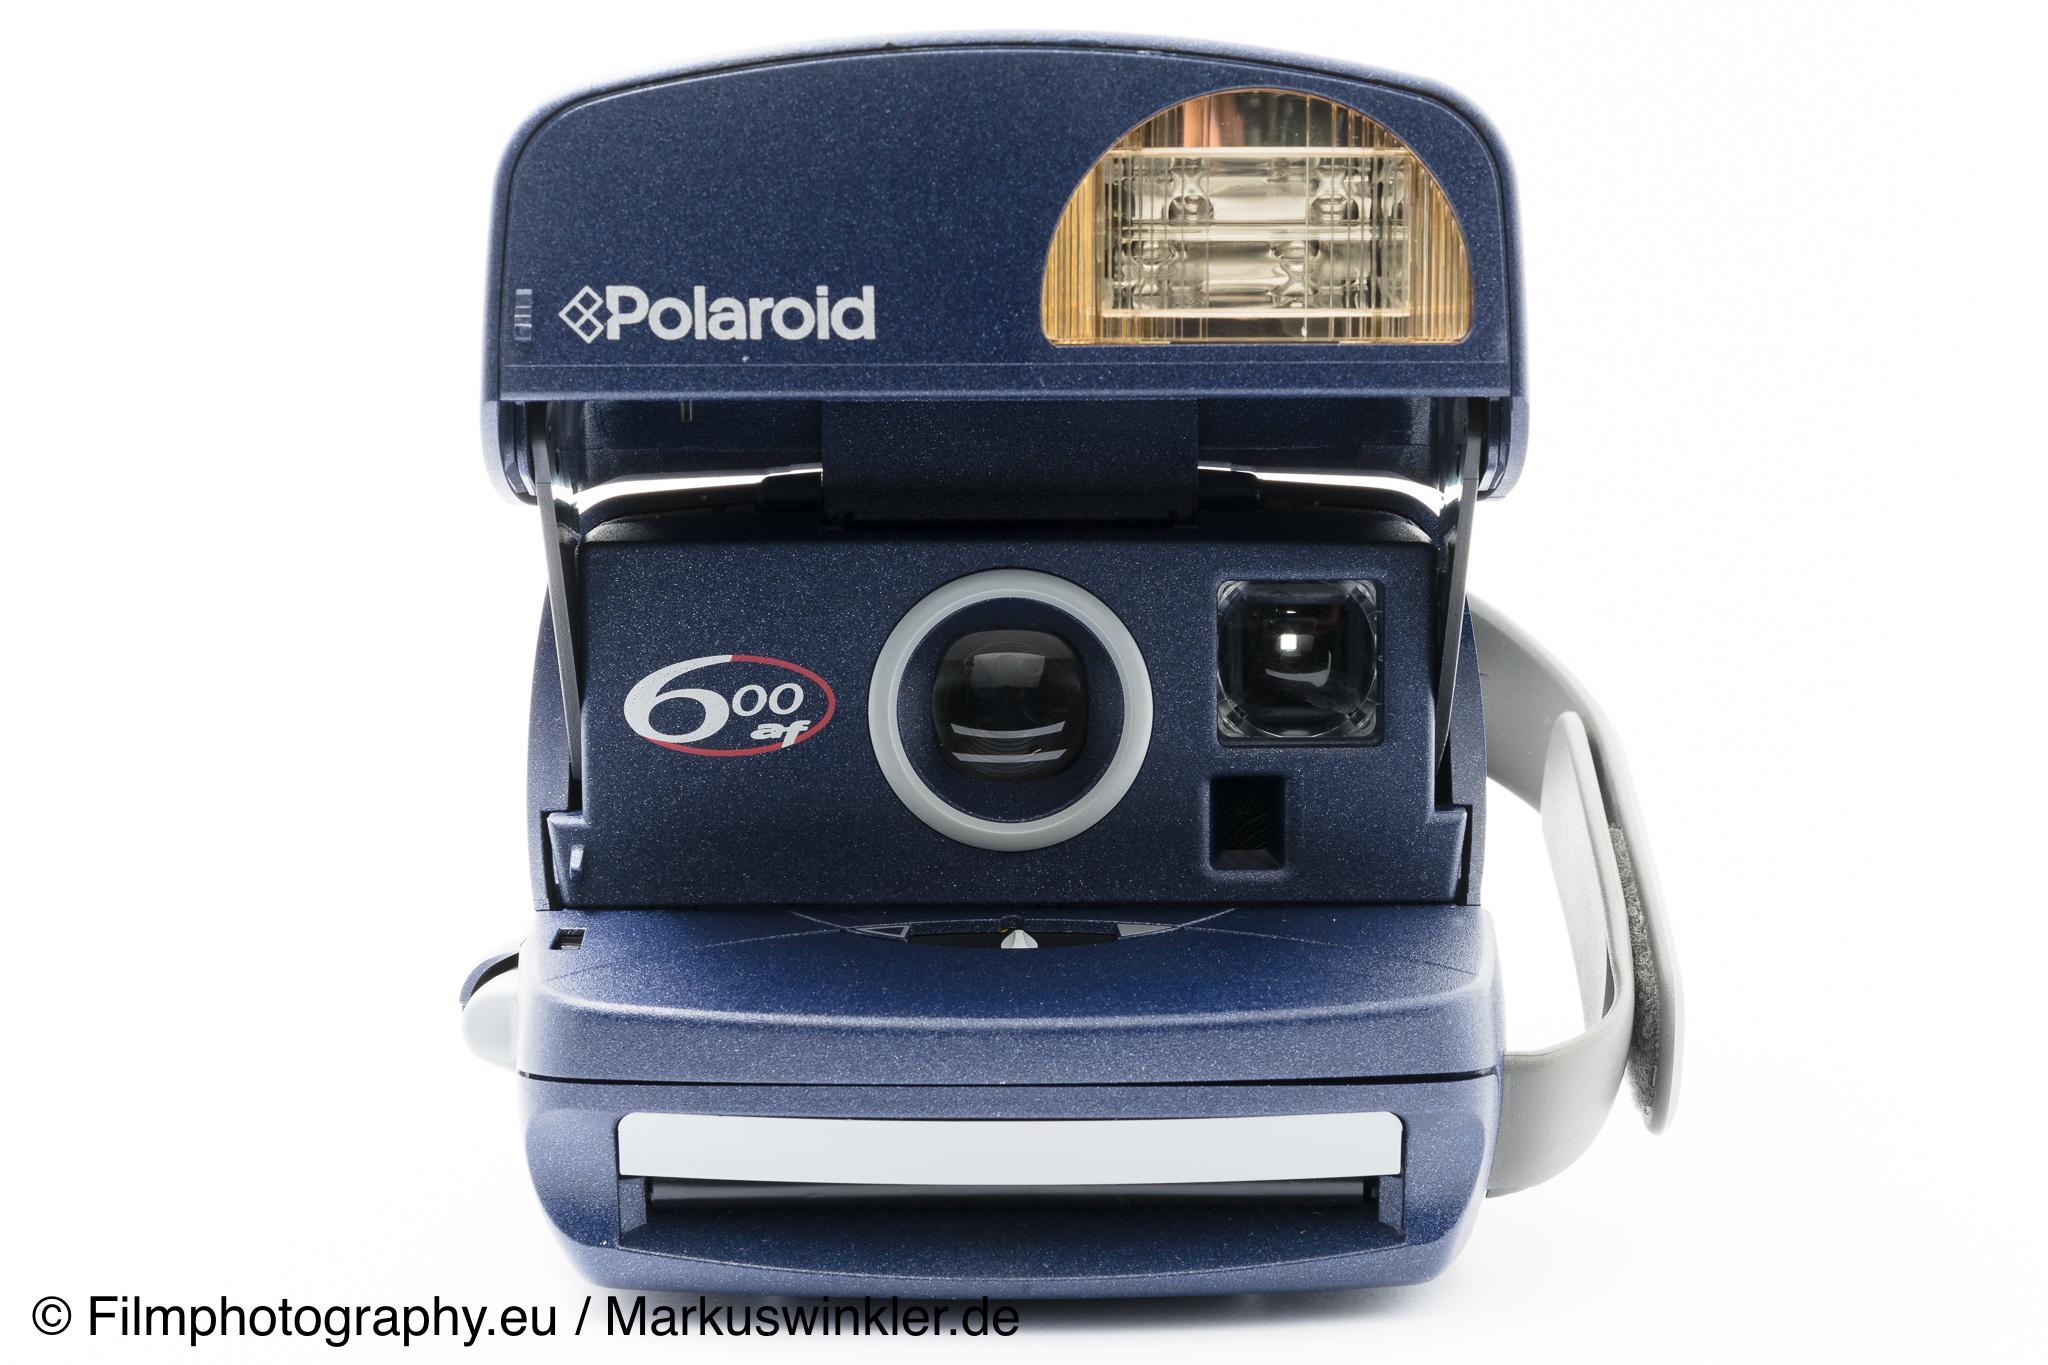 polaroid 600 af polaroid 600 autofocus sofortbildkamera. Black Bedroom Furniture Sets. Home Design Ideas